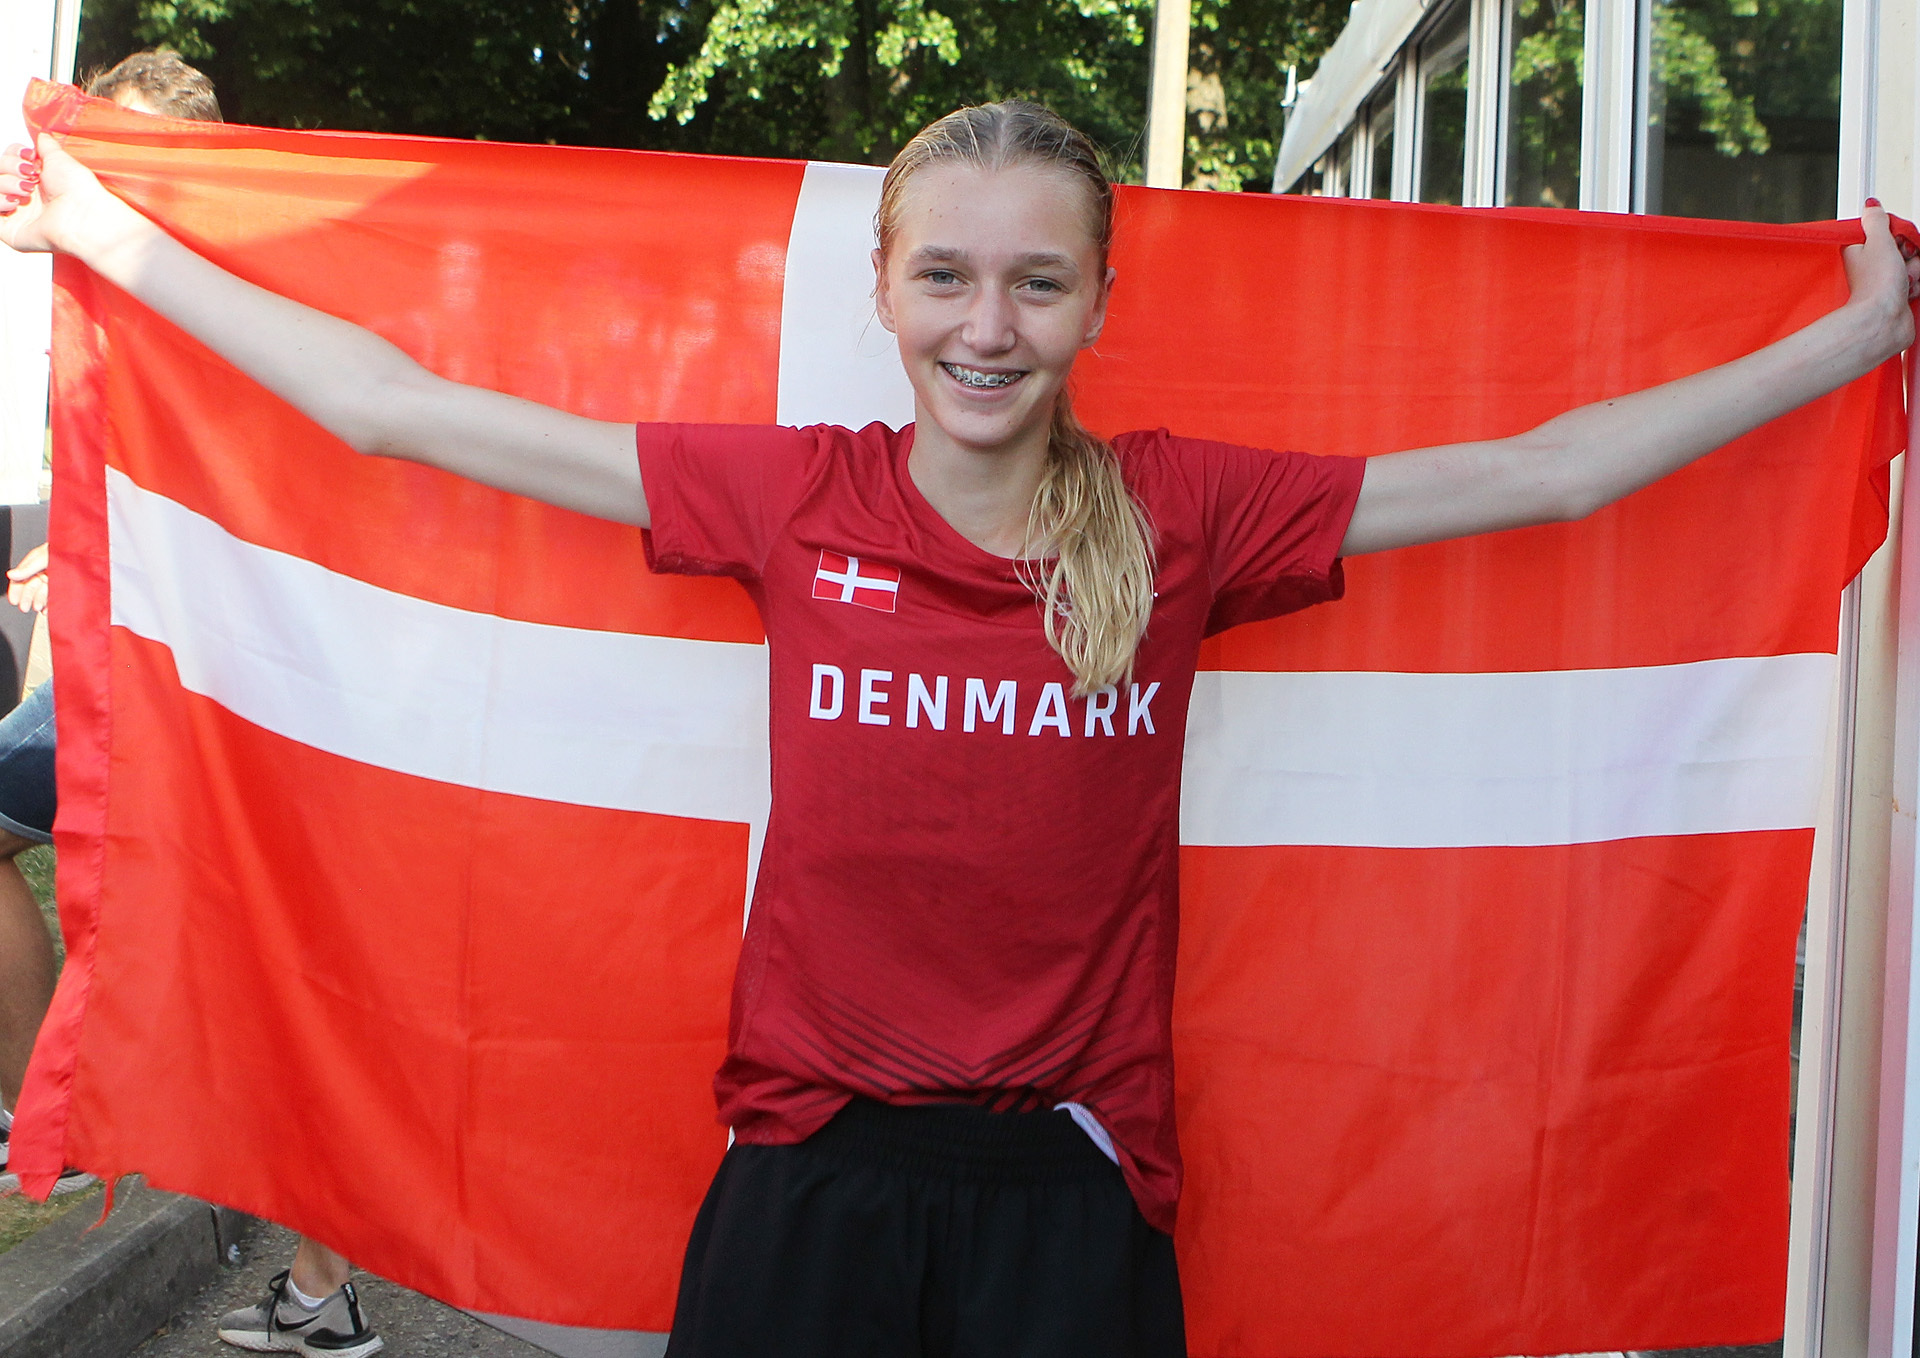 sofia_Thoegersen_dansk_nr2_3000m_4hundreler_foran_Ina_H-Haugen_A20G2975.jpg